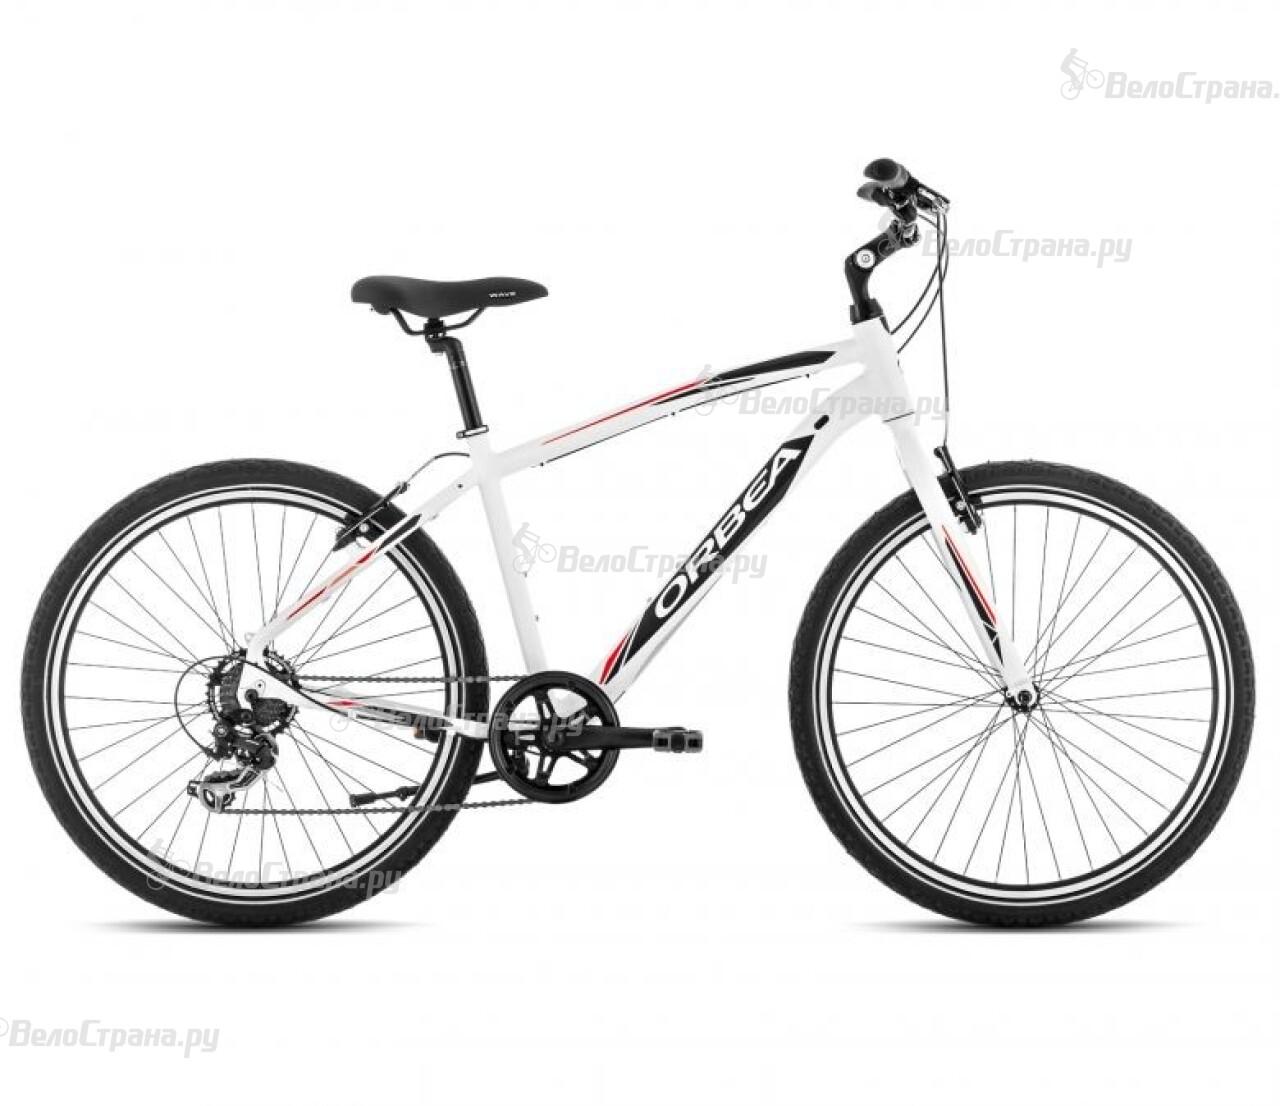 Велосипед Orbea Comfort 26 40 (2014)